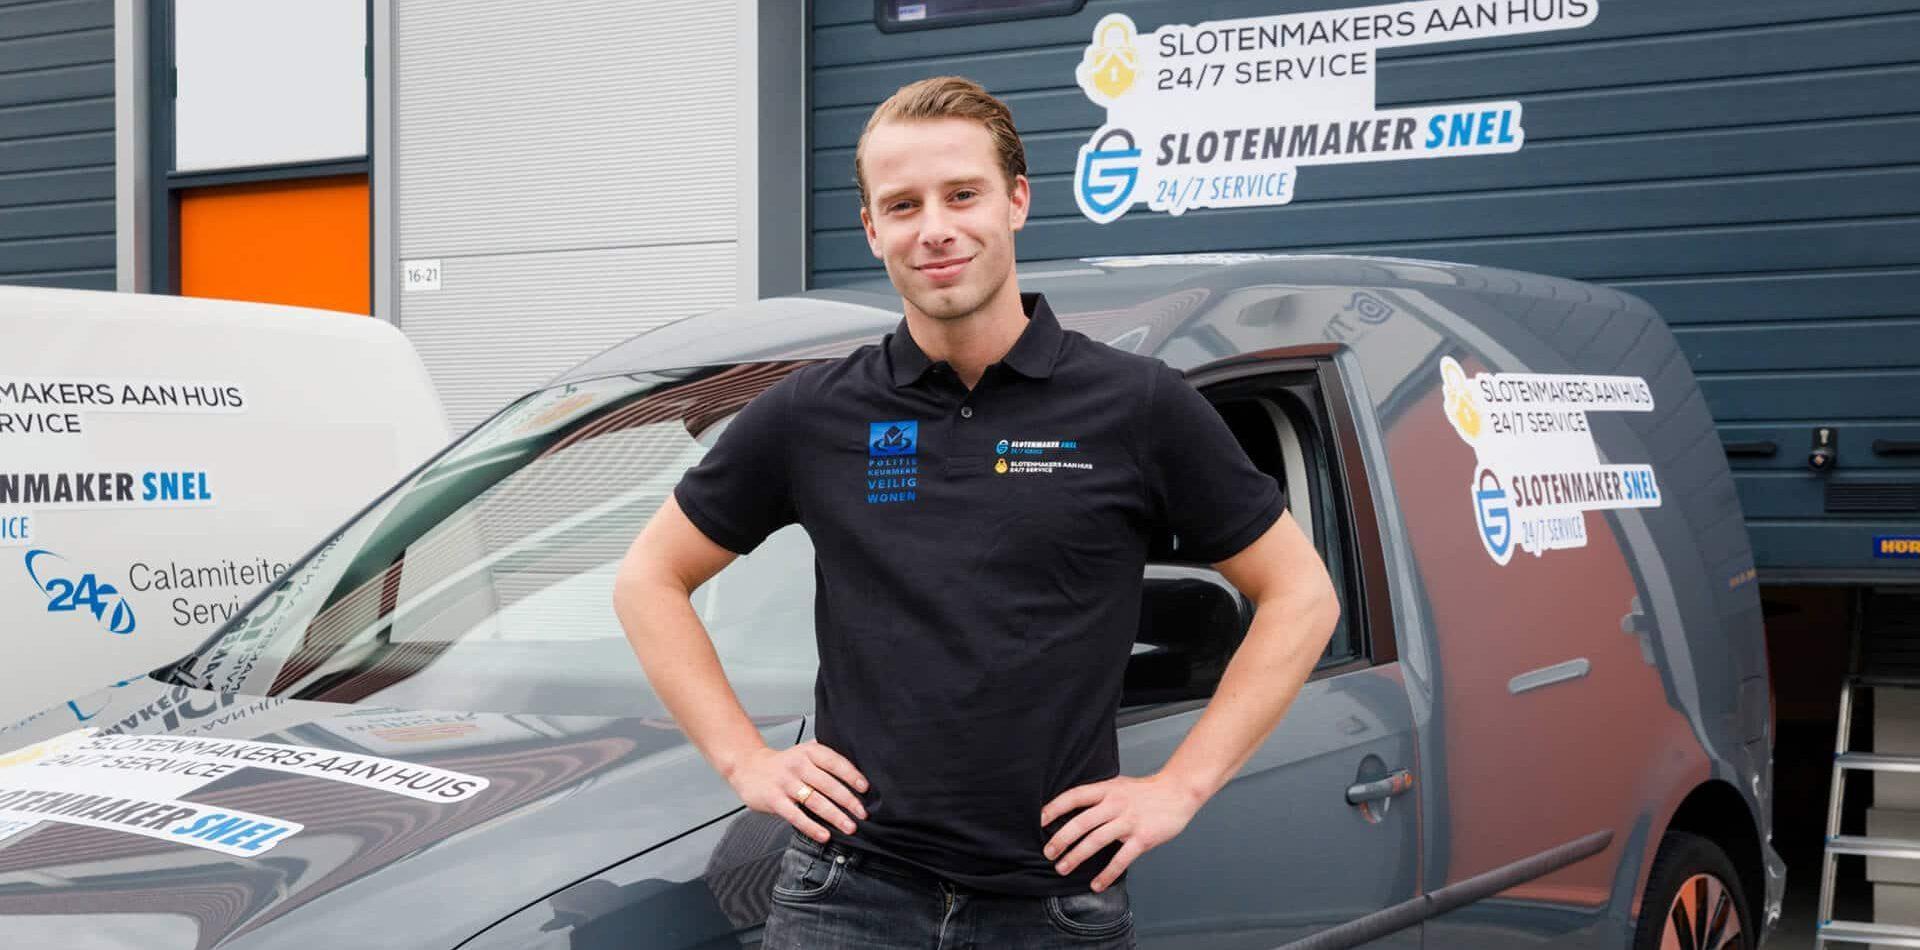 Slotenmaker Opmeer (6)